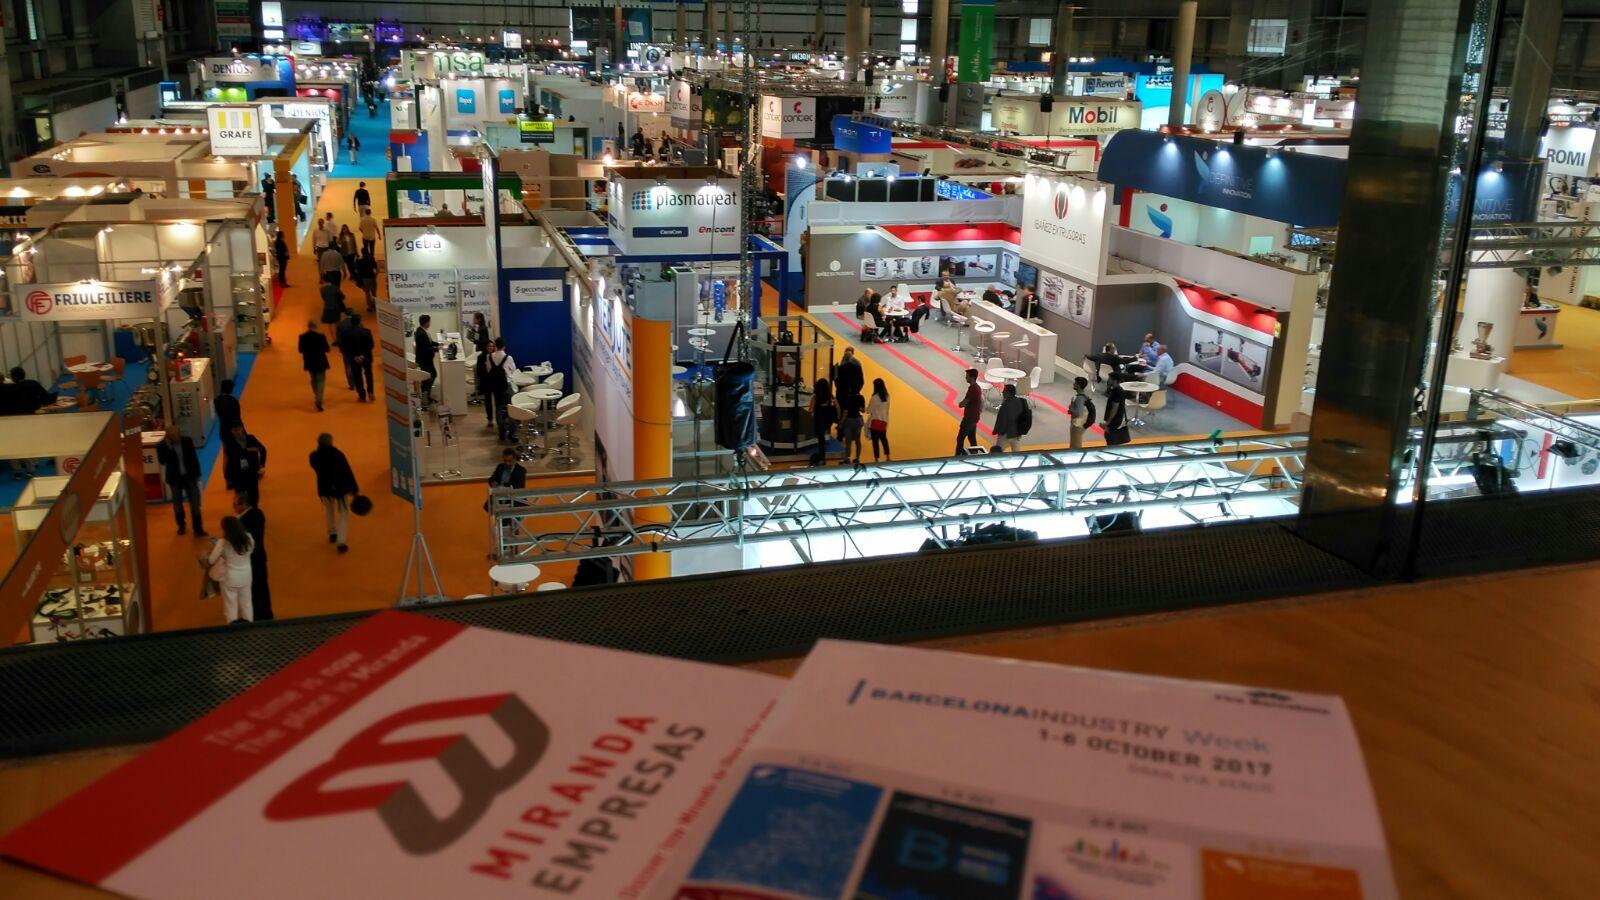 Miranda empresas en barcelona industry week miranda empresas - Empresas constructoras en barcelona ...